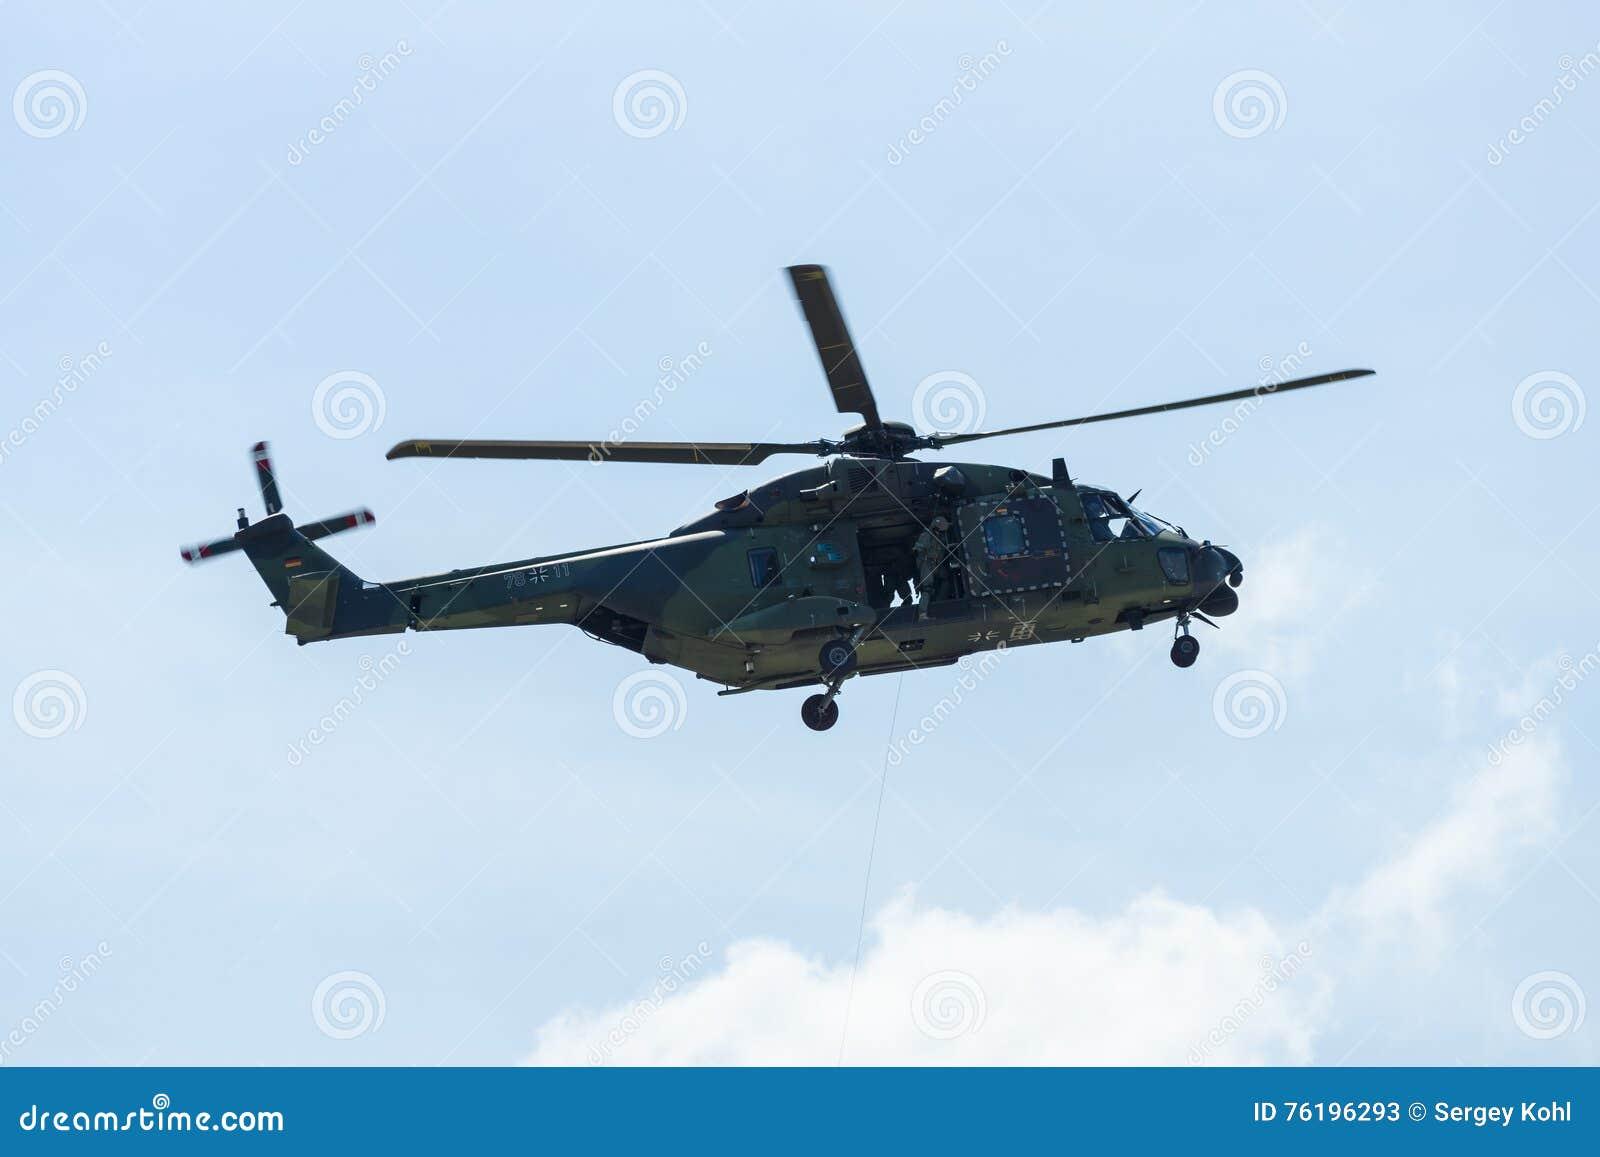 Elicottero In Tedesco : Elicottero nh dell esercito tedesco fotografia stock